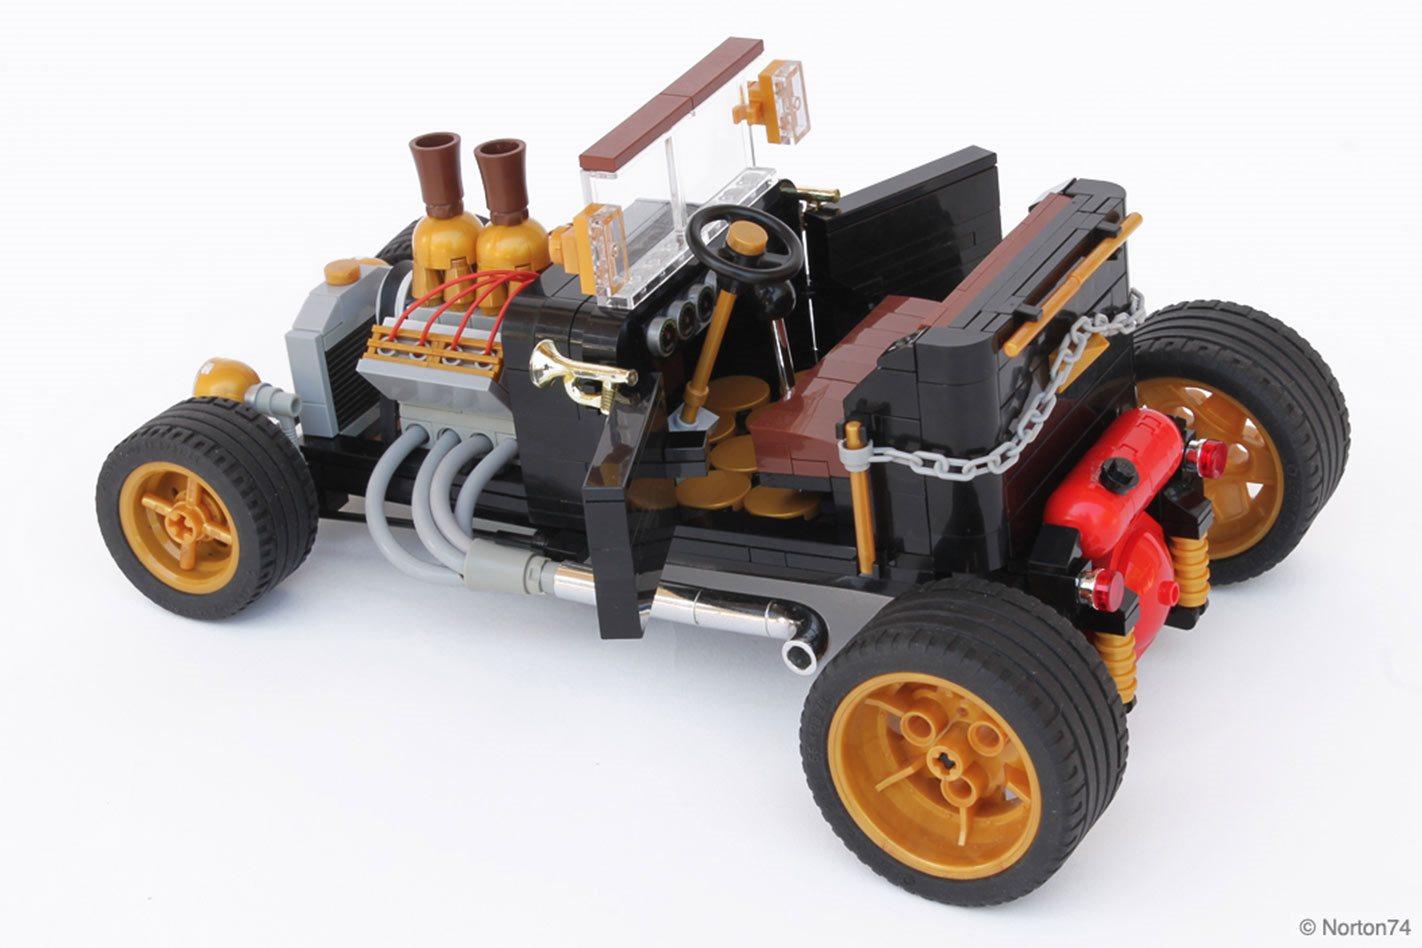 Lego Built My Hot Rod